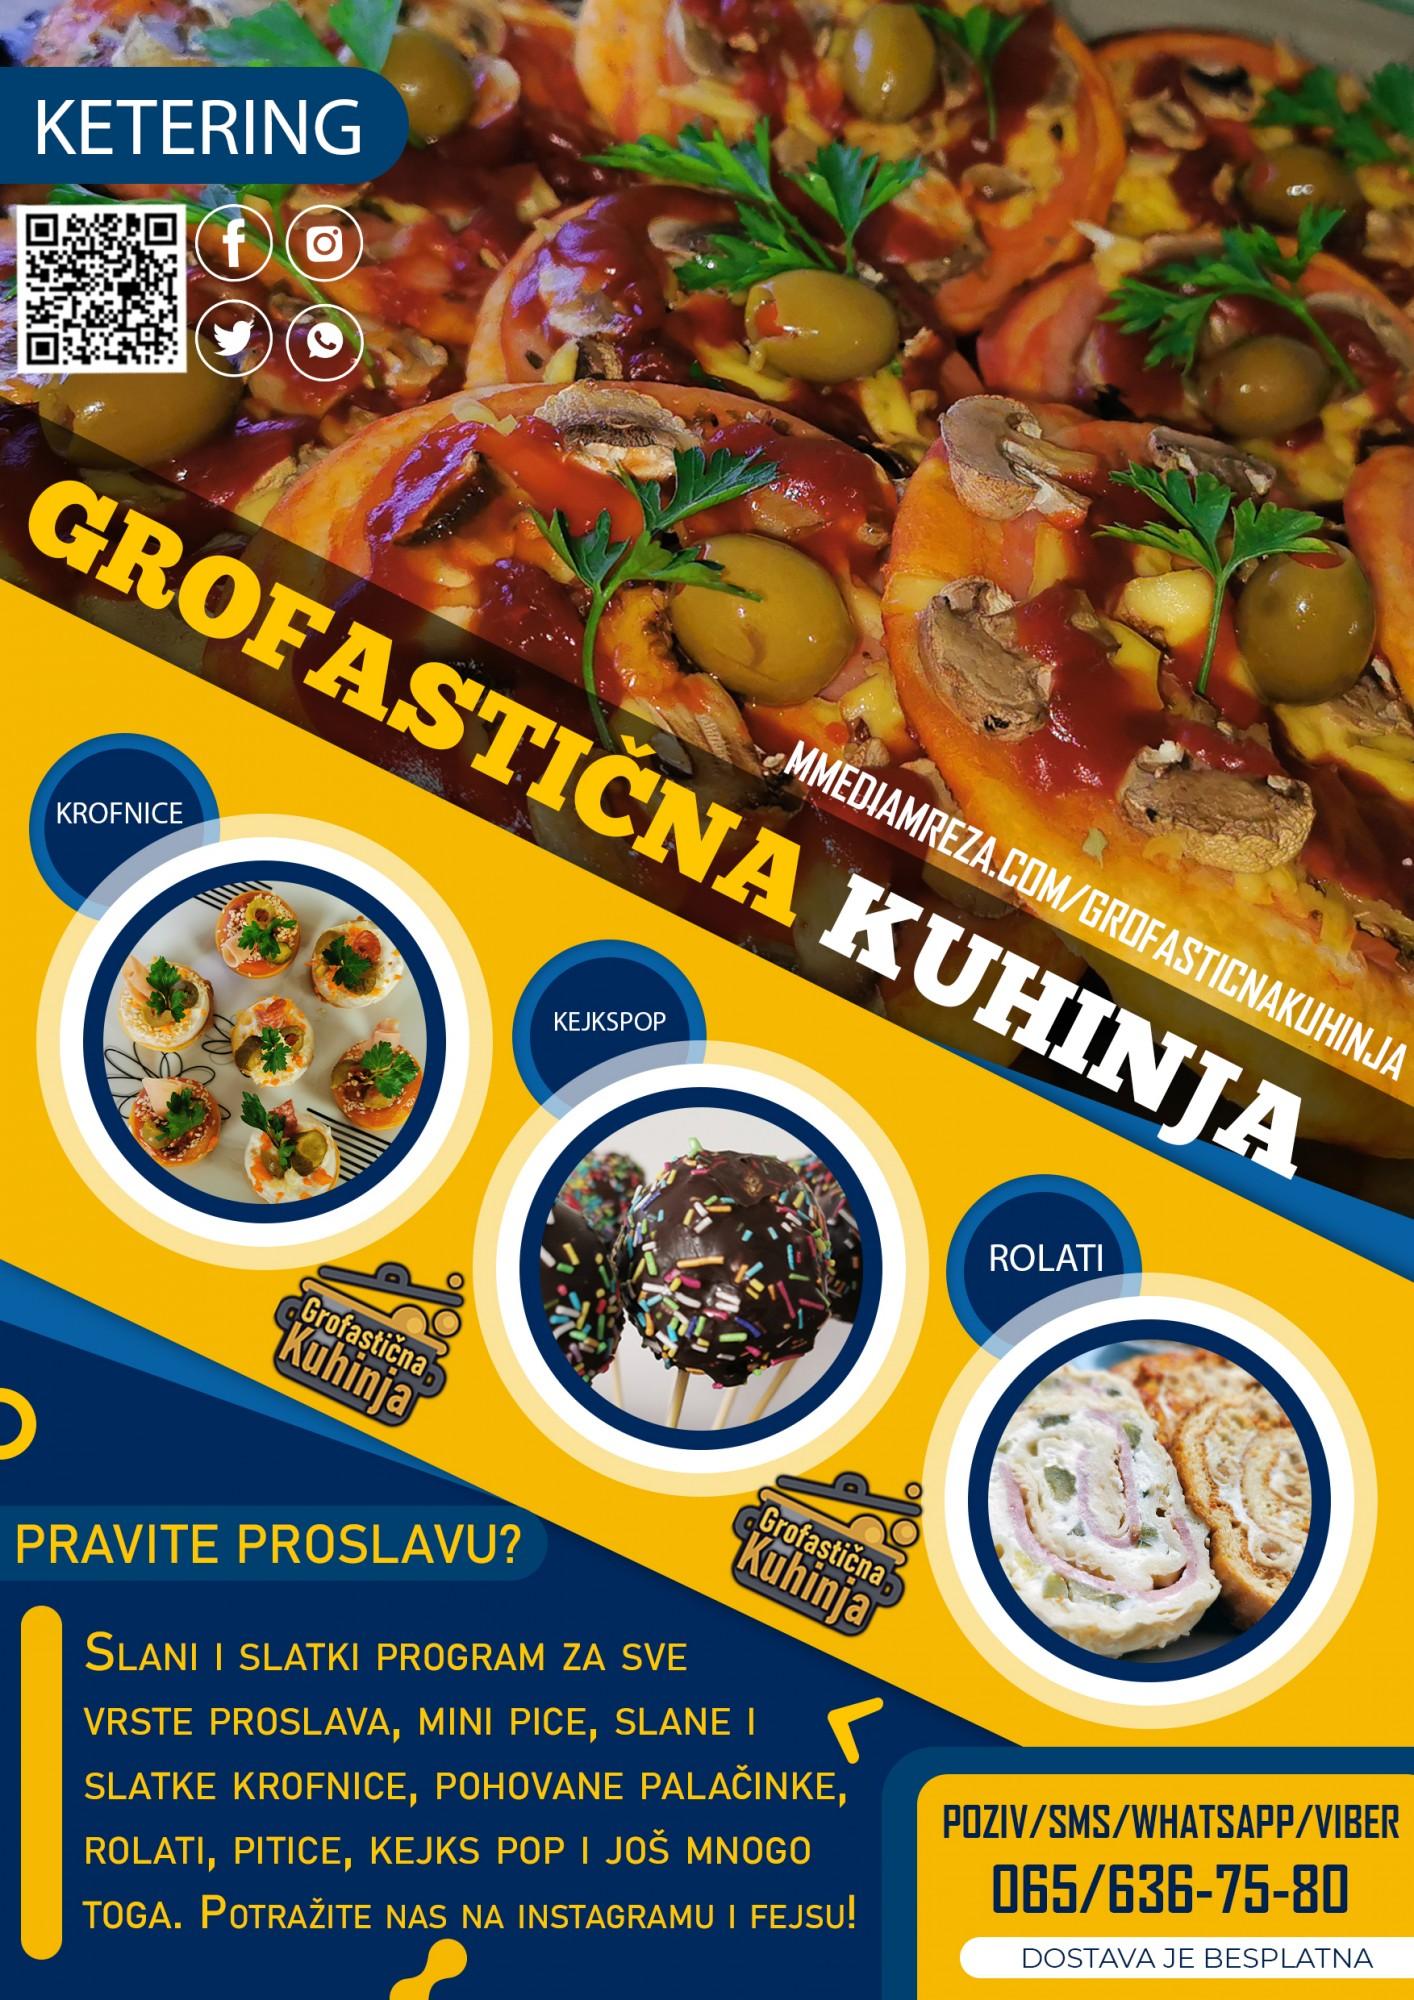 Grofastična kuhinja - Ketering